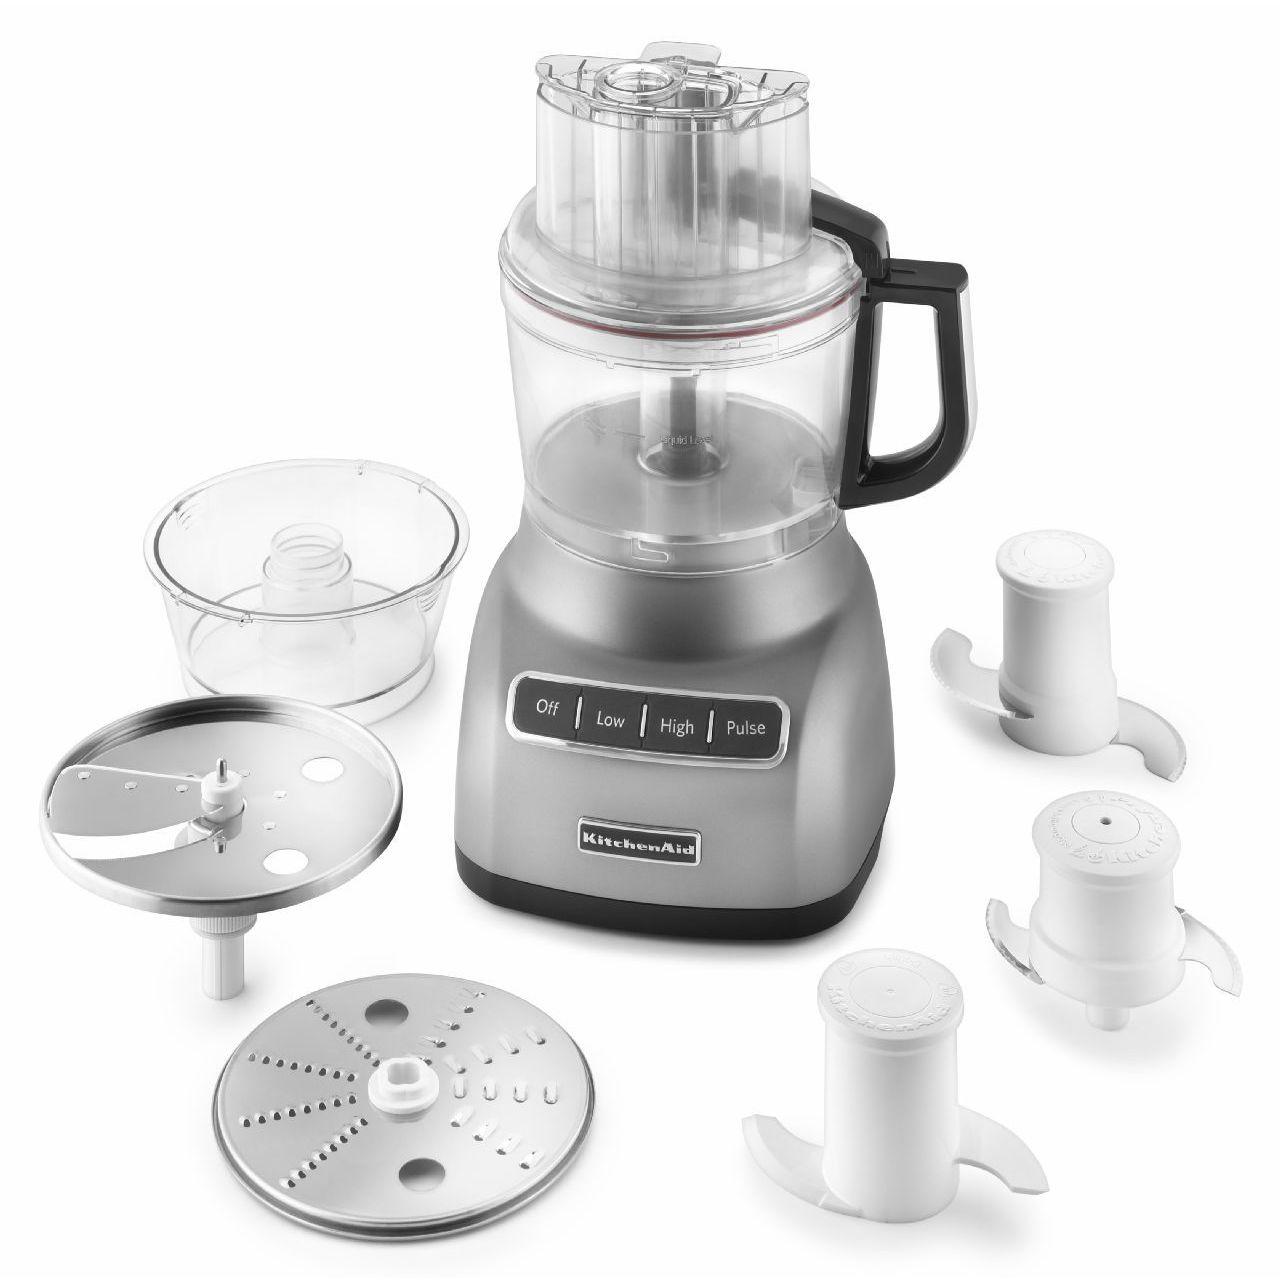 KitchenAid KFP0922CU Contour Silver 9-cup Food Processor - Free ...